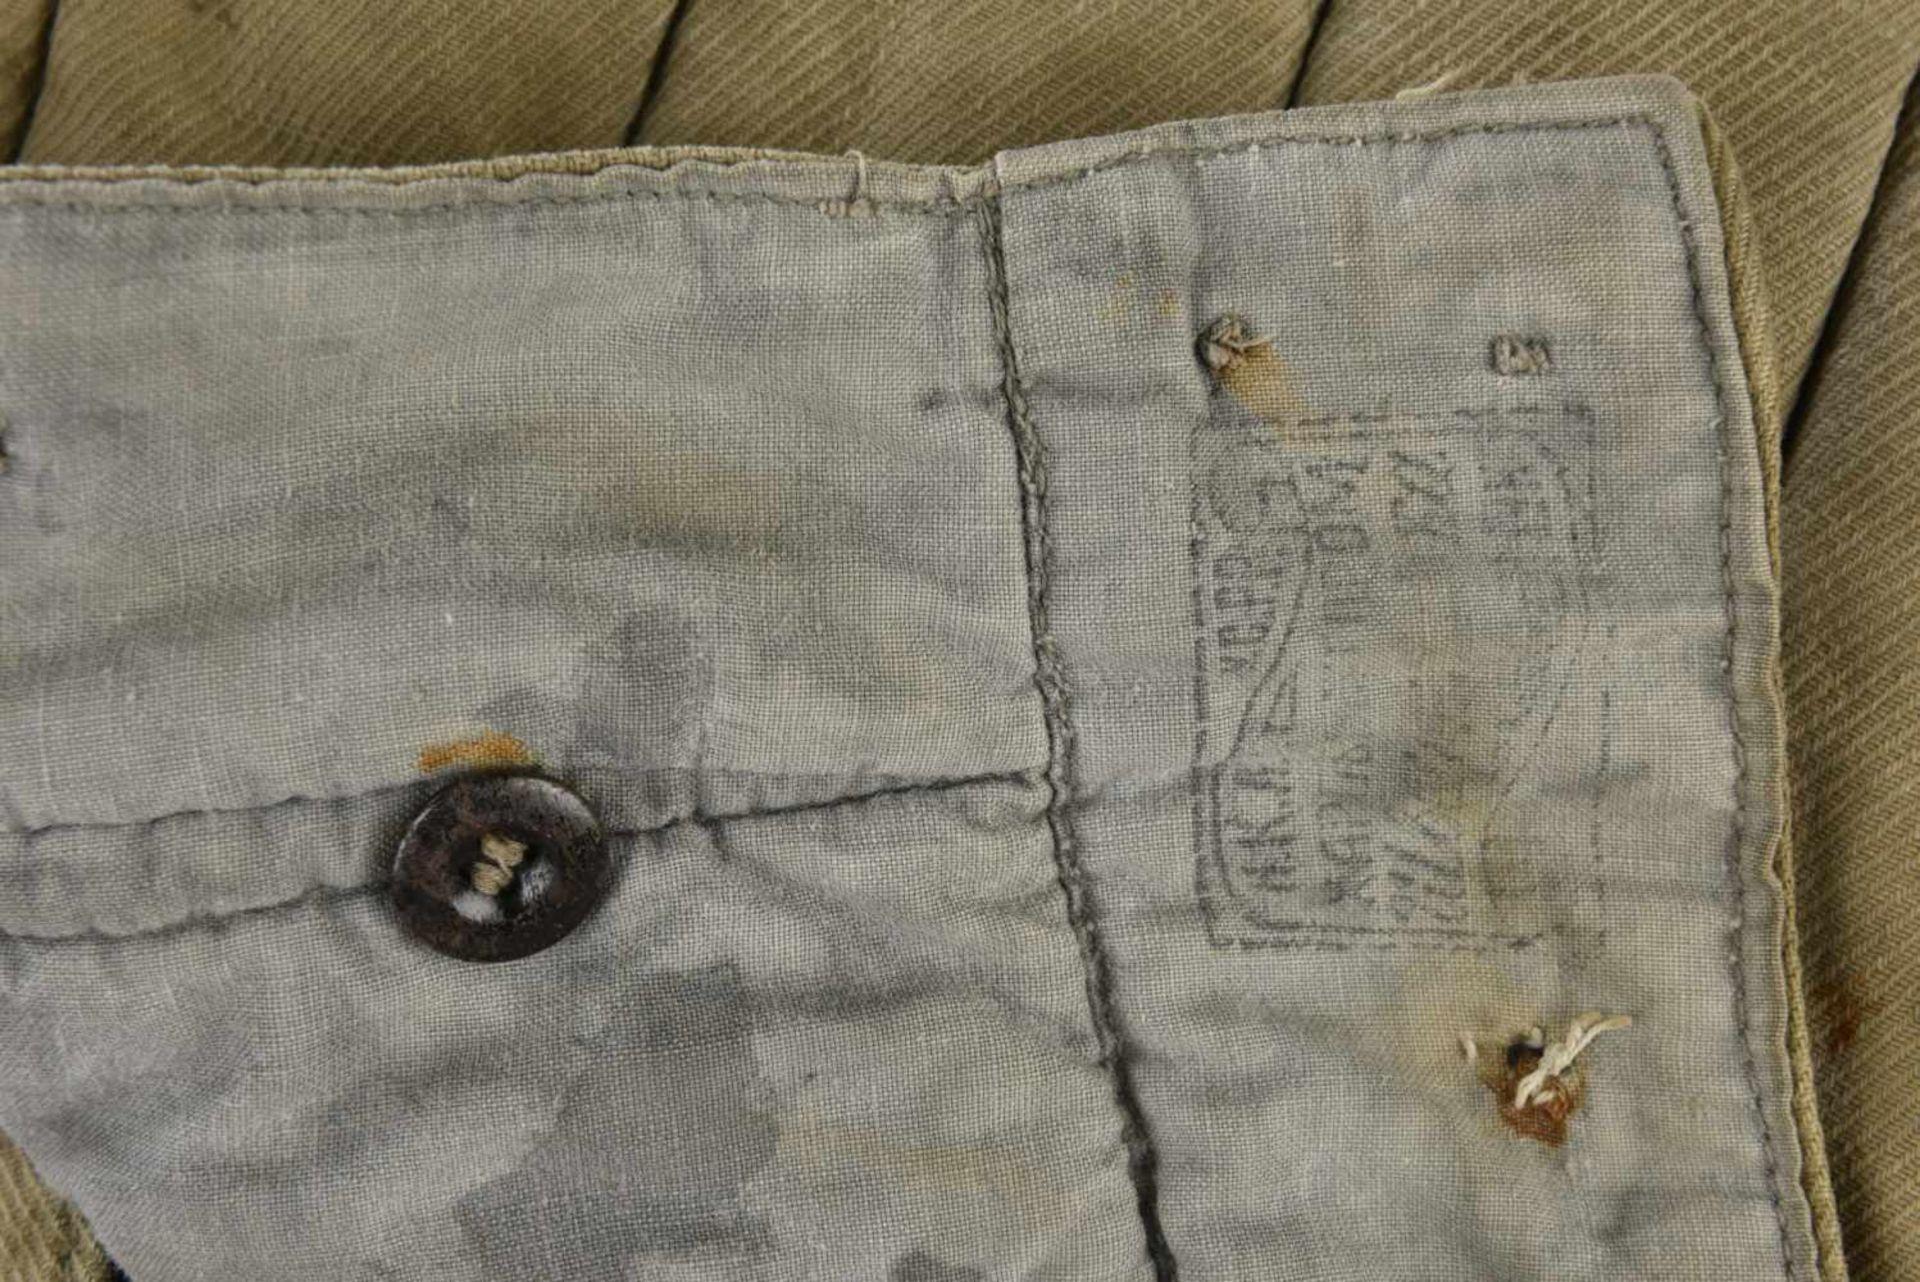 Ensemble matelassé comprenant la veste Telogreyka et le pantalon Ensemble homogène trouvé en - Bild 4 aus 4